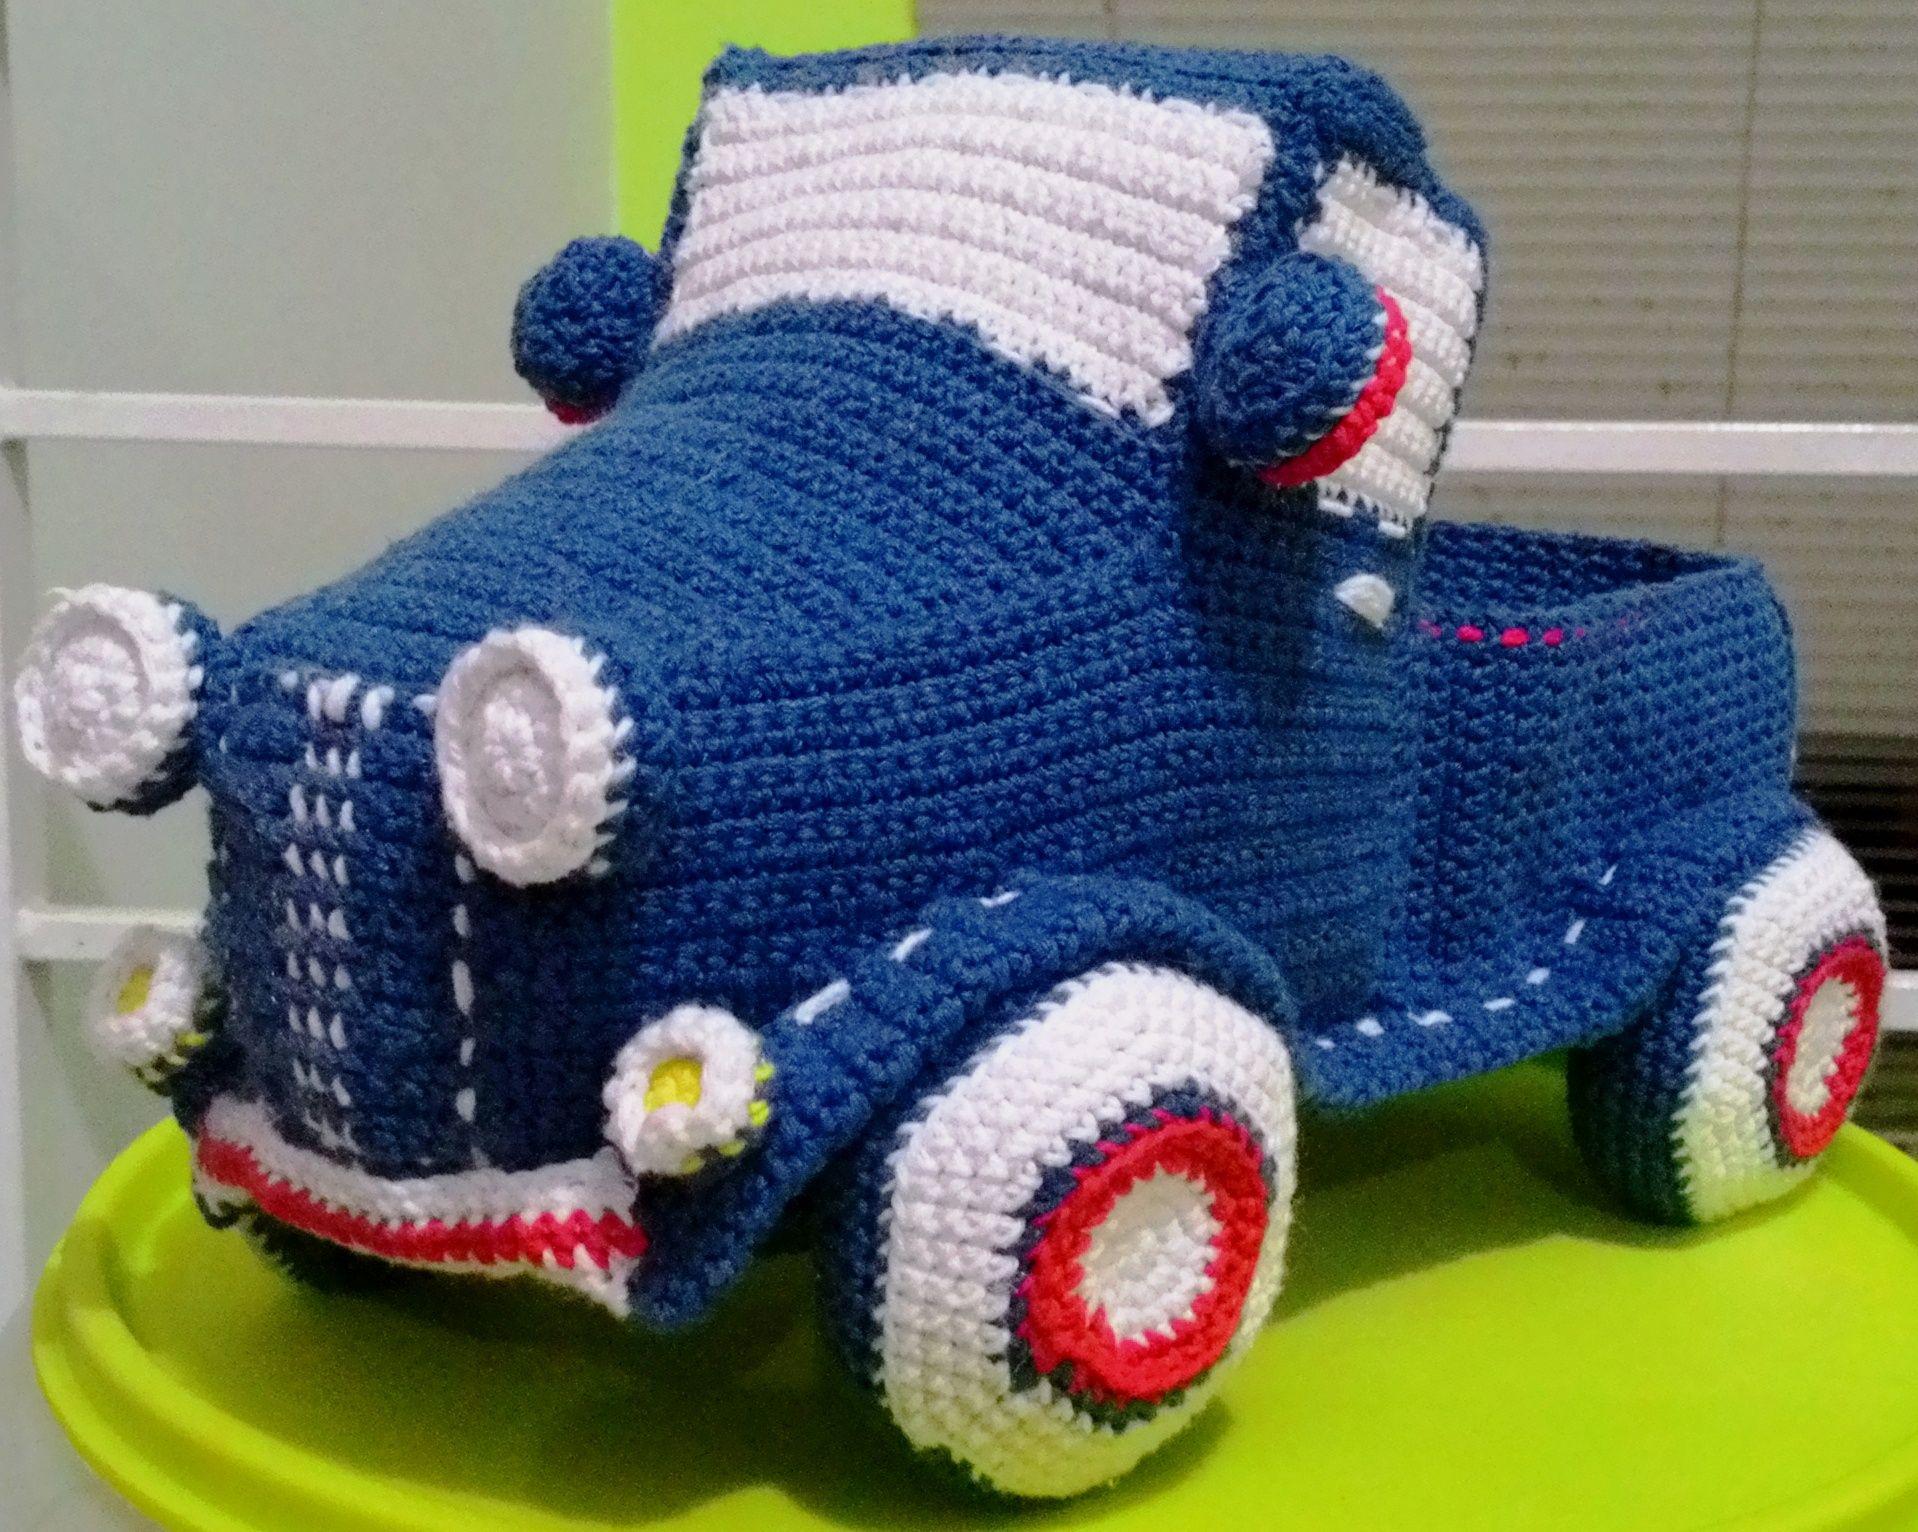 pattern by Caloca Crochet - Vintage Pickup Truck